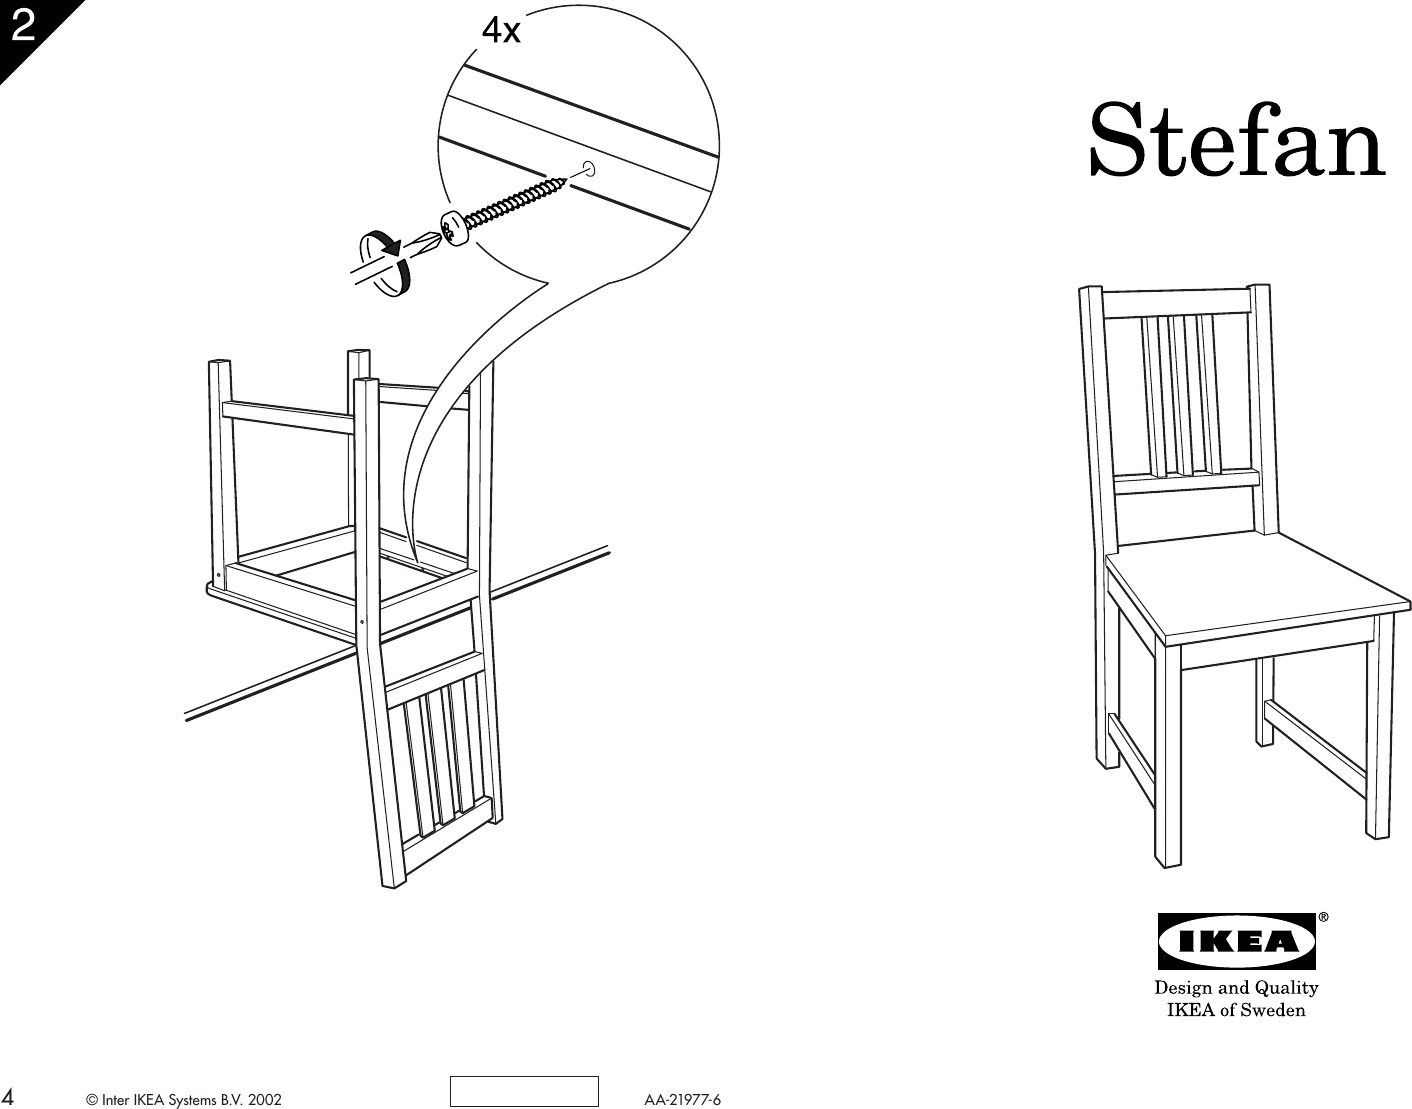 Ikea Stefan Chair Assembly Instruction